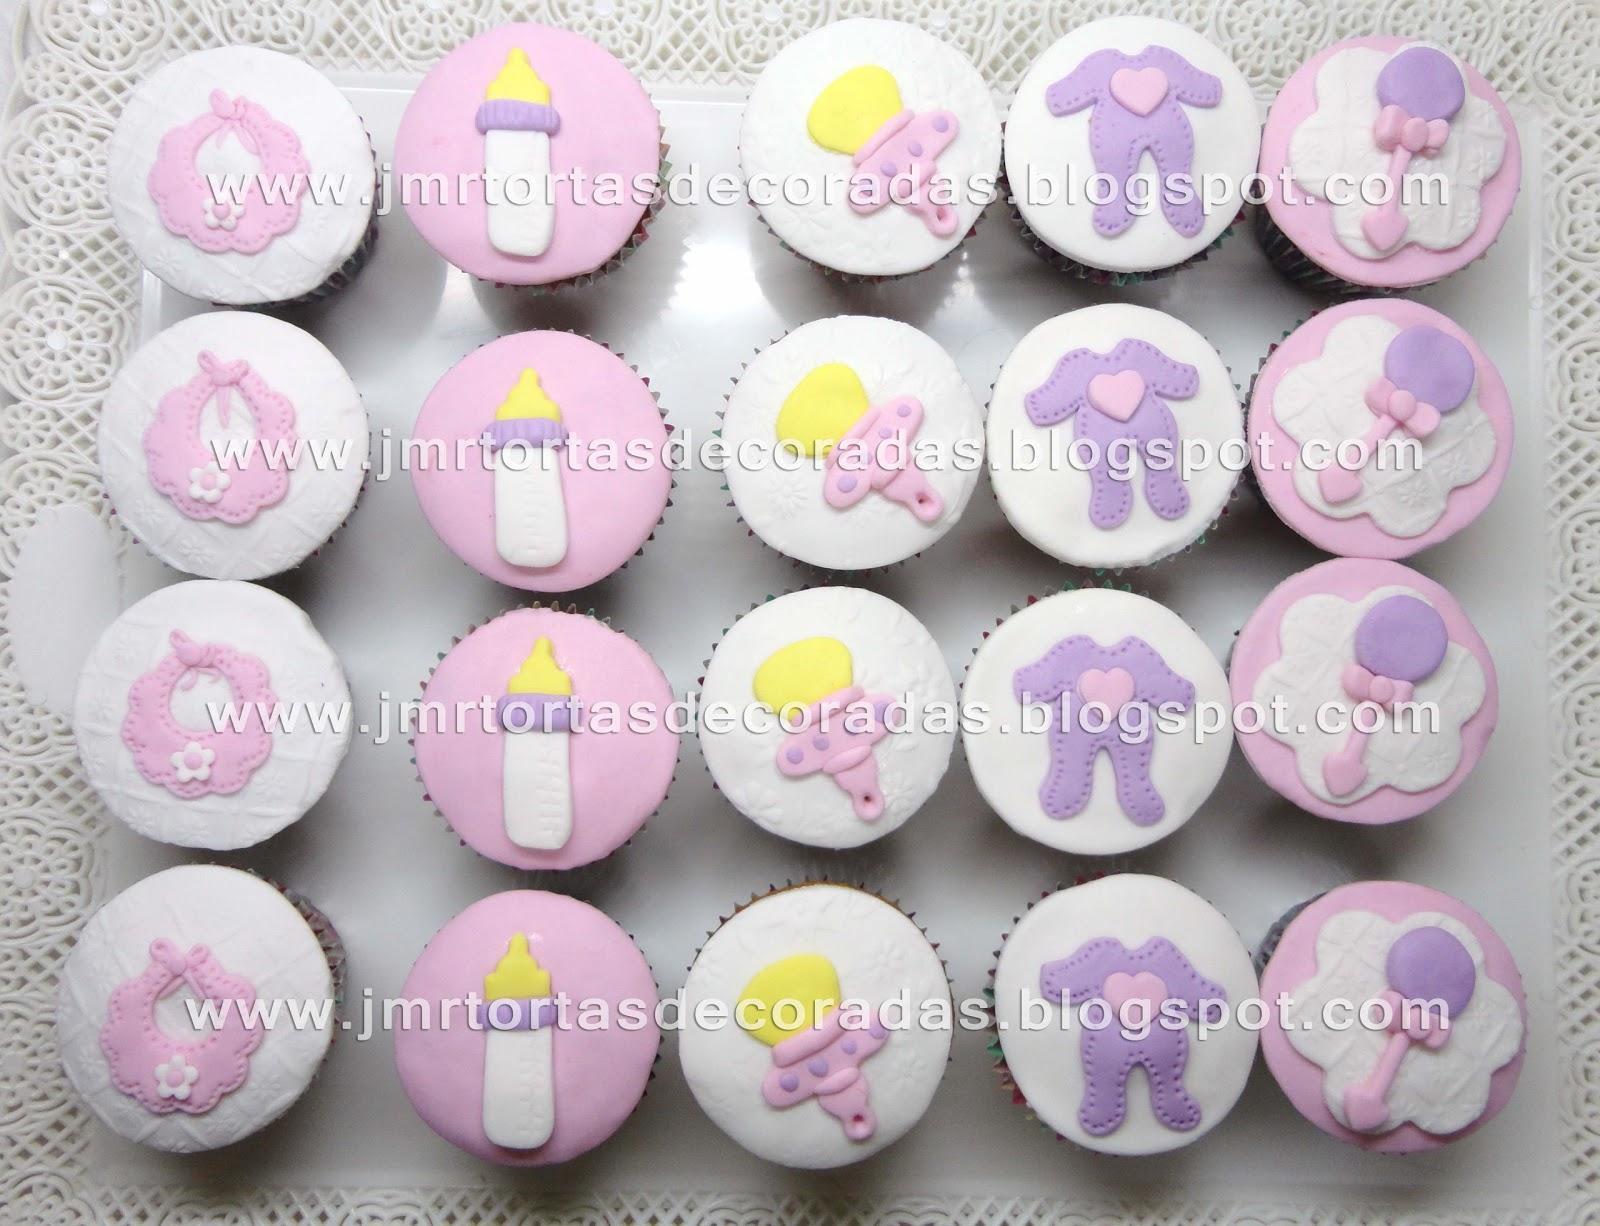 Cupcakes Baby Shower  JMR Tortas Decoradas